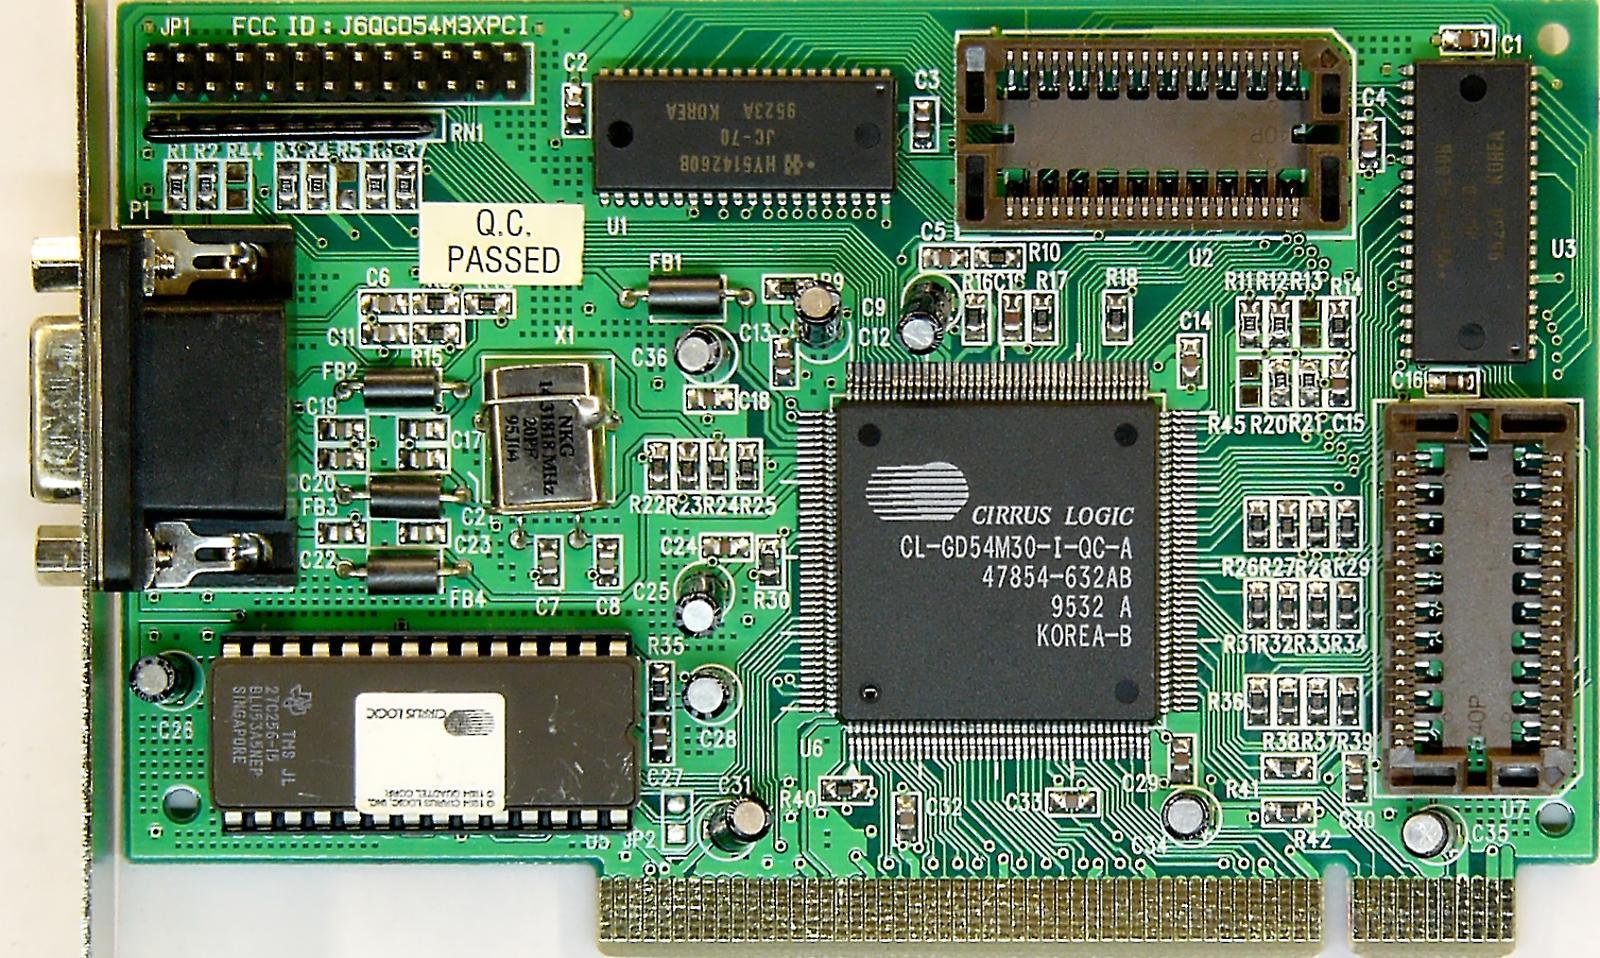 CL-GD5429-86QC-B